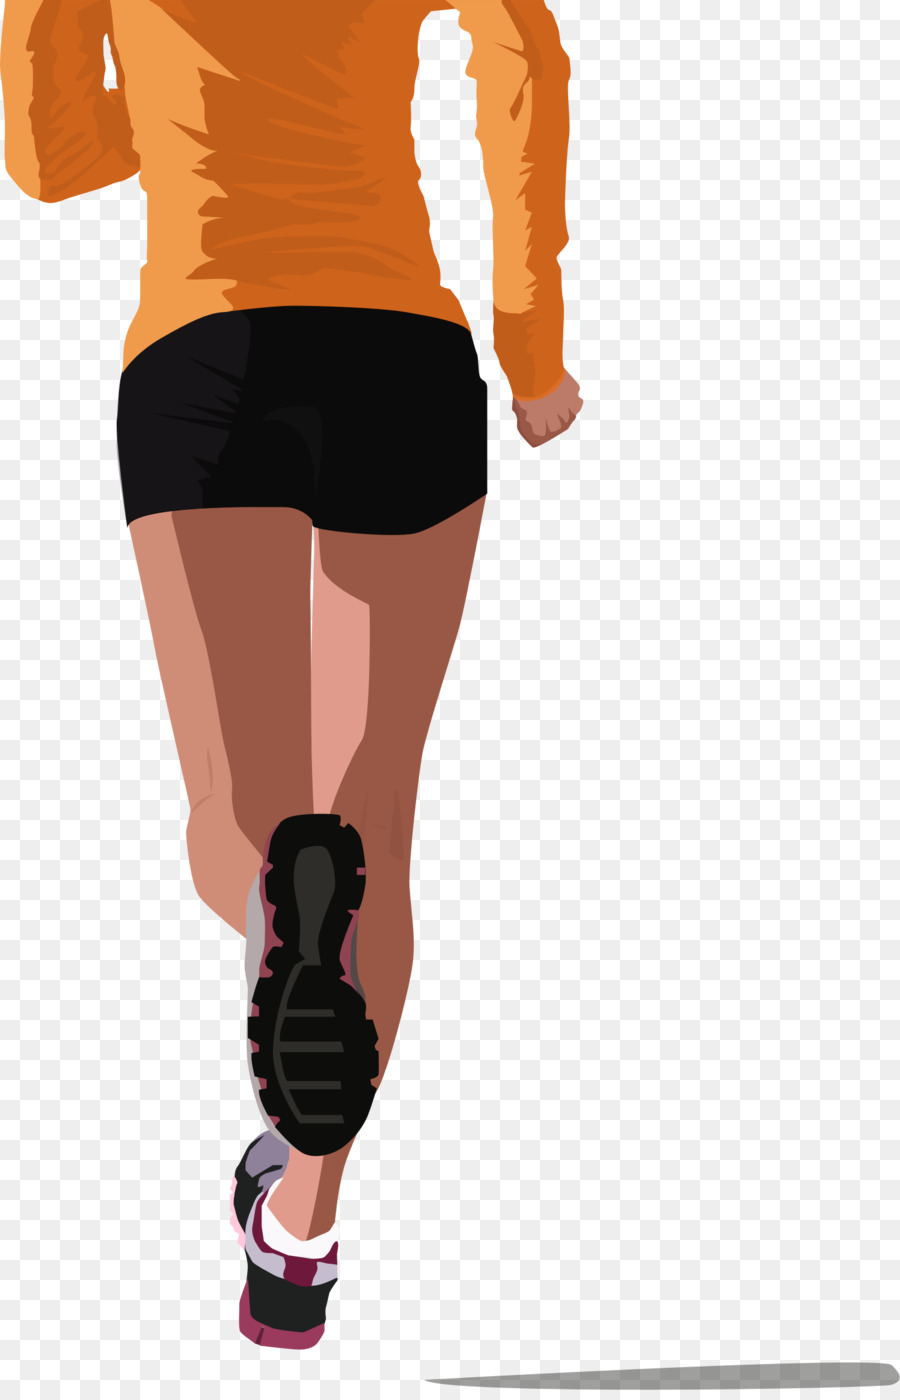 Running clipart Long-distance running Jogging